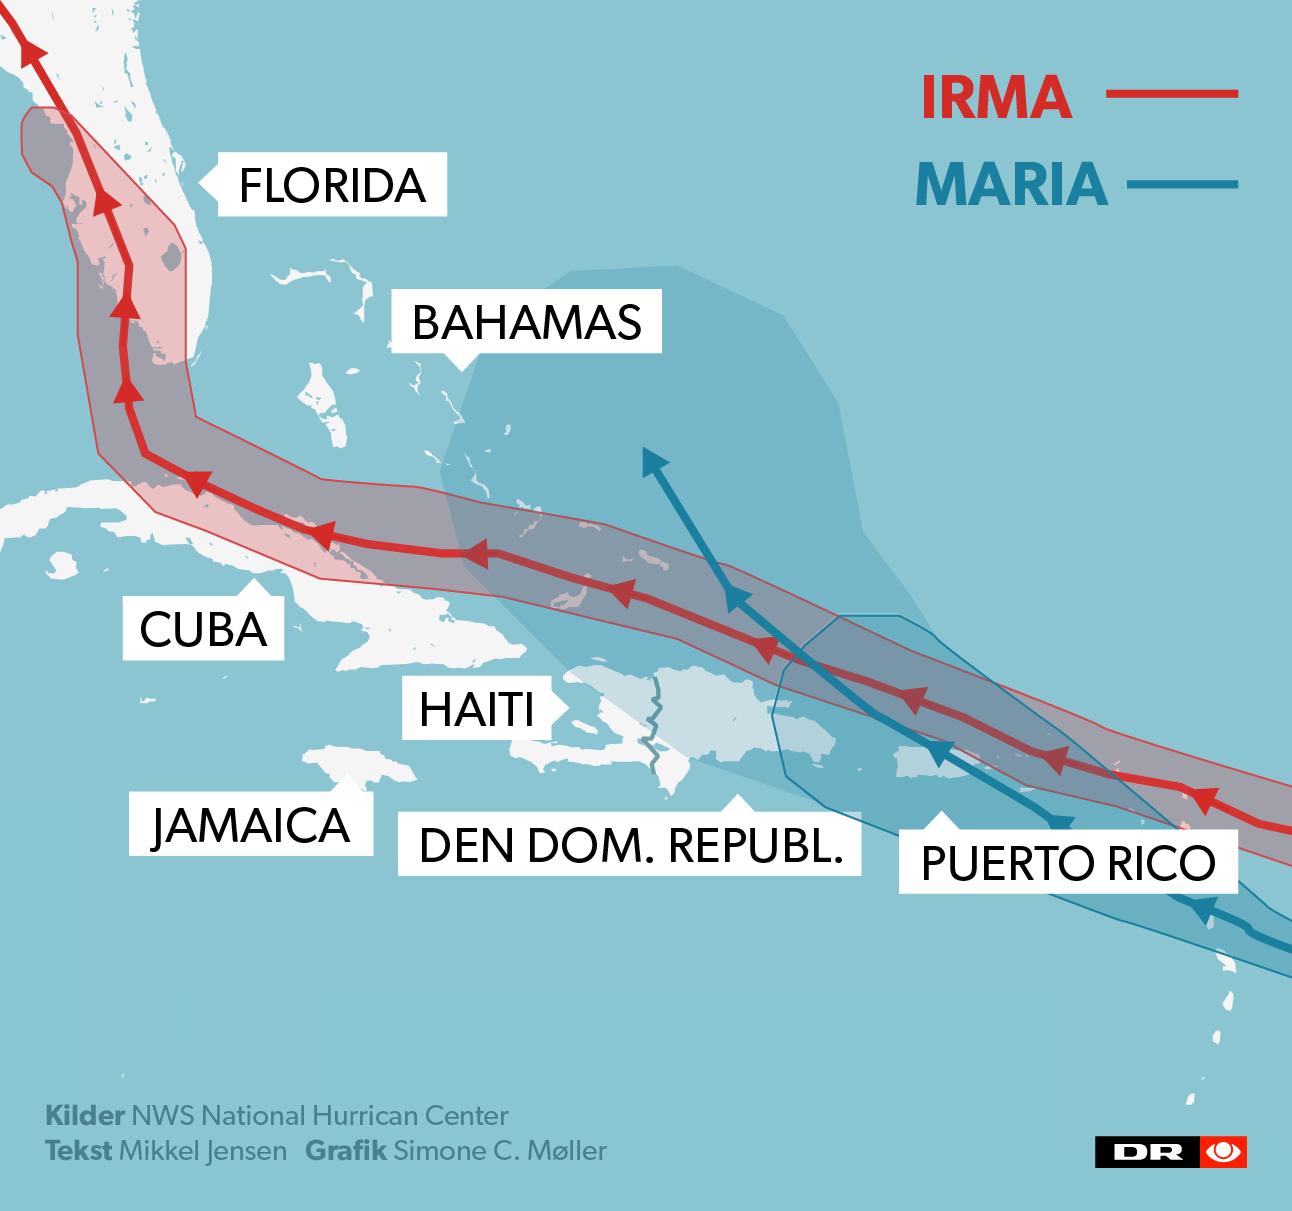 Orkanen Maria følger Irmas spor op gennem Caribien.